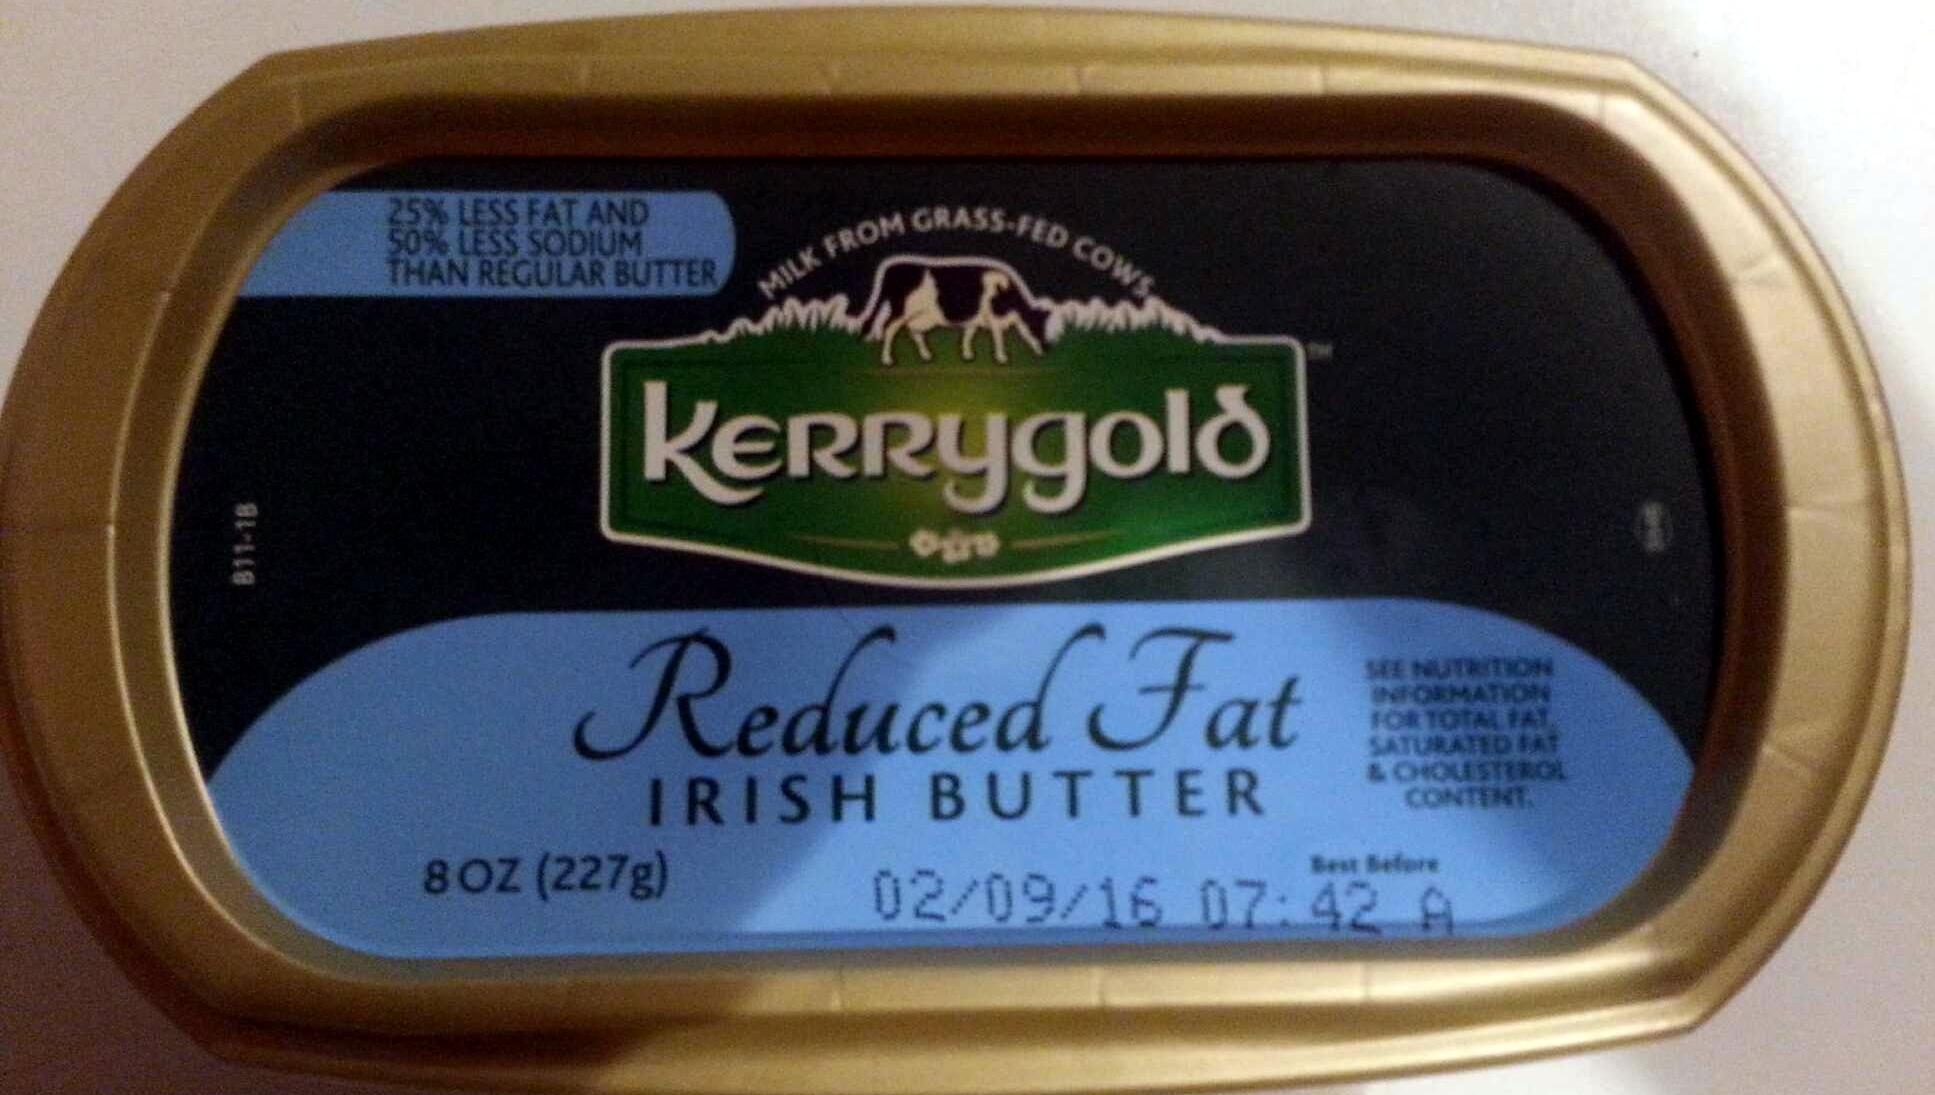 Kerrygold, reduced fat irish butter - Product - en